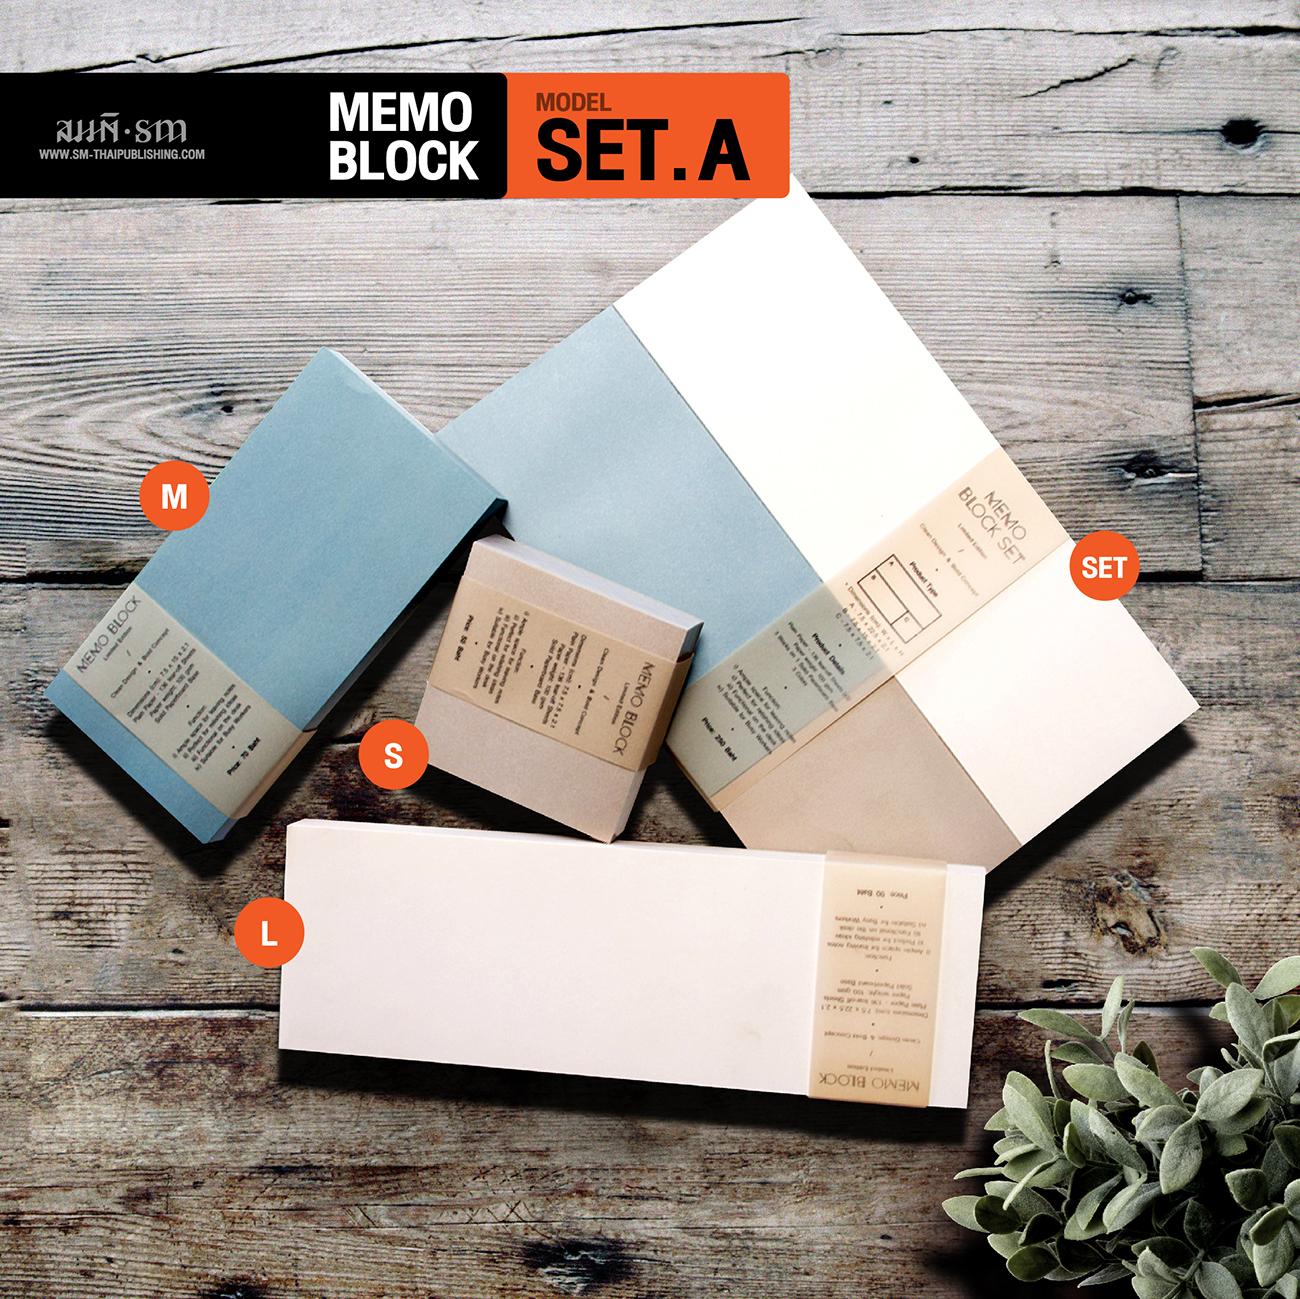 Memo Block A | กระดาษจดบันทึก